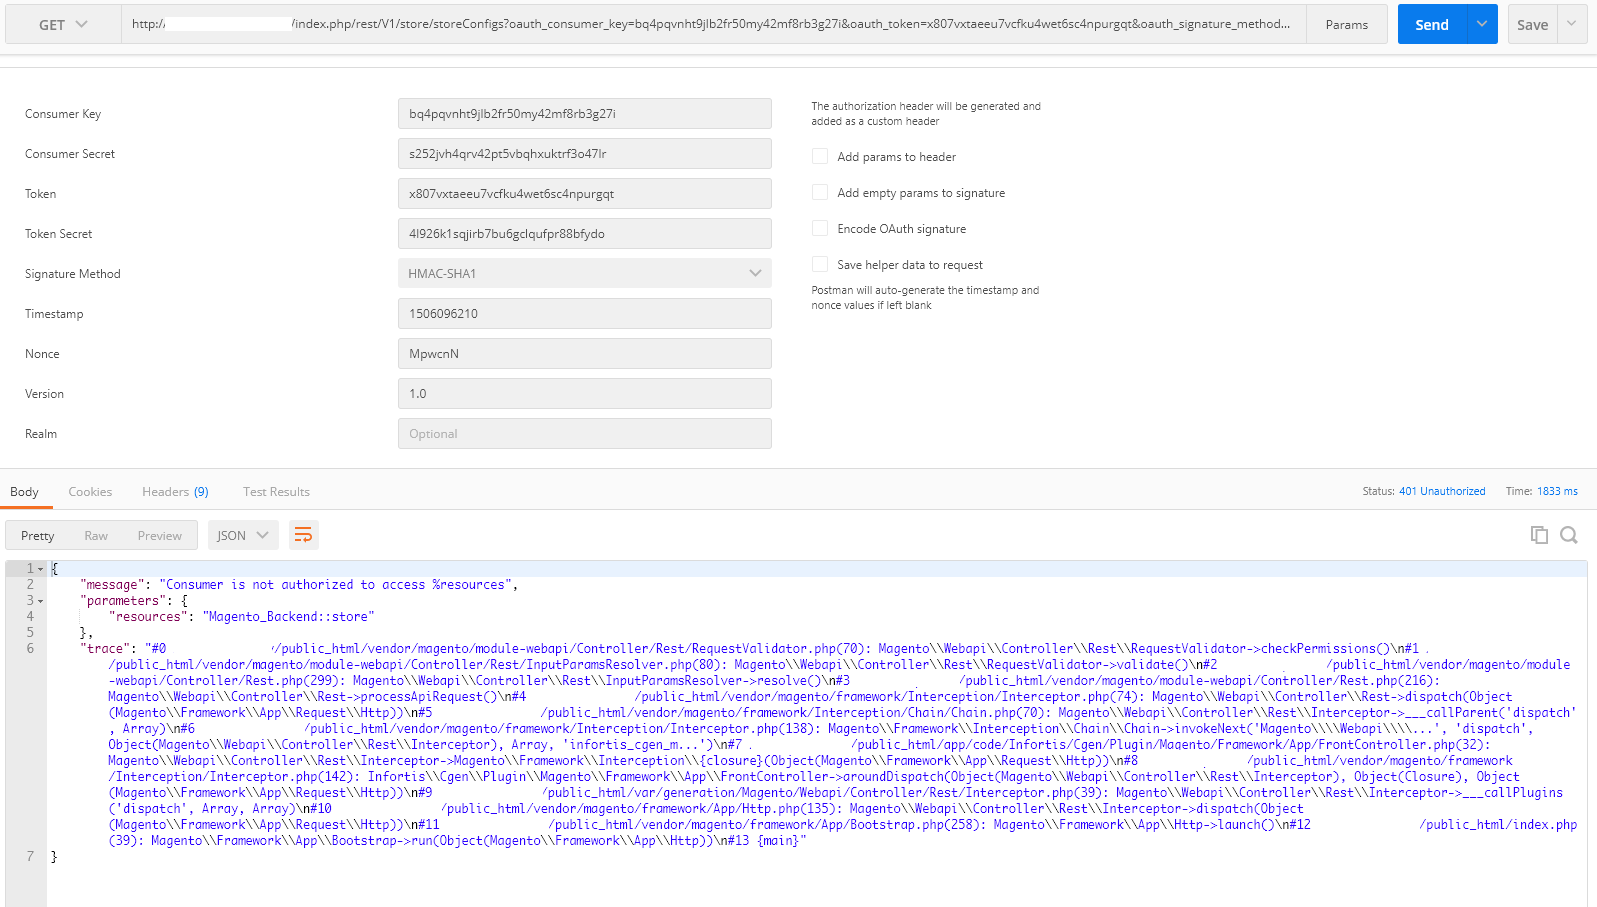 Magento api rest webservice · Issue #11202 · magento